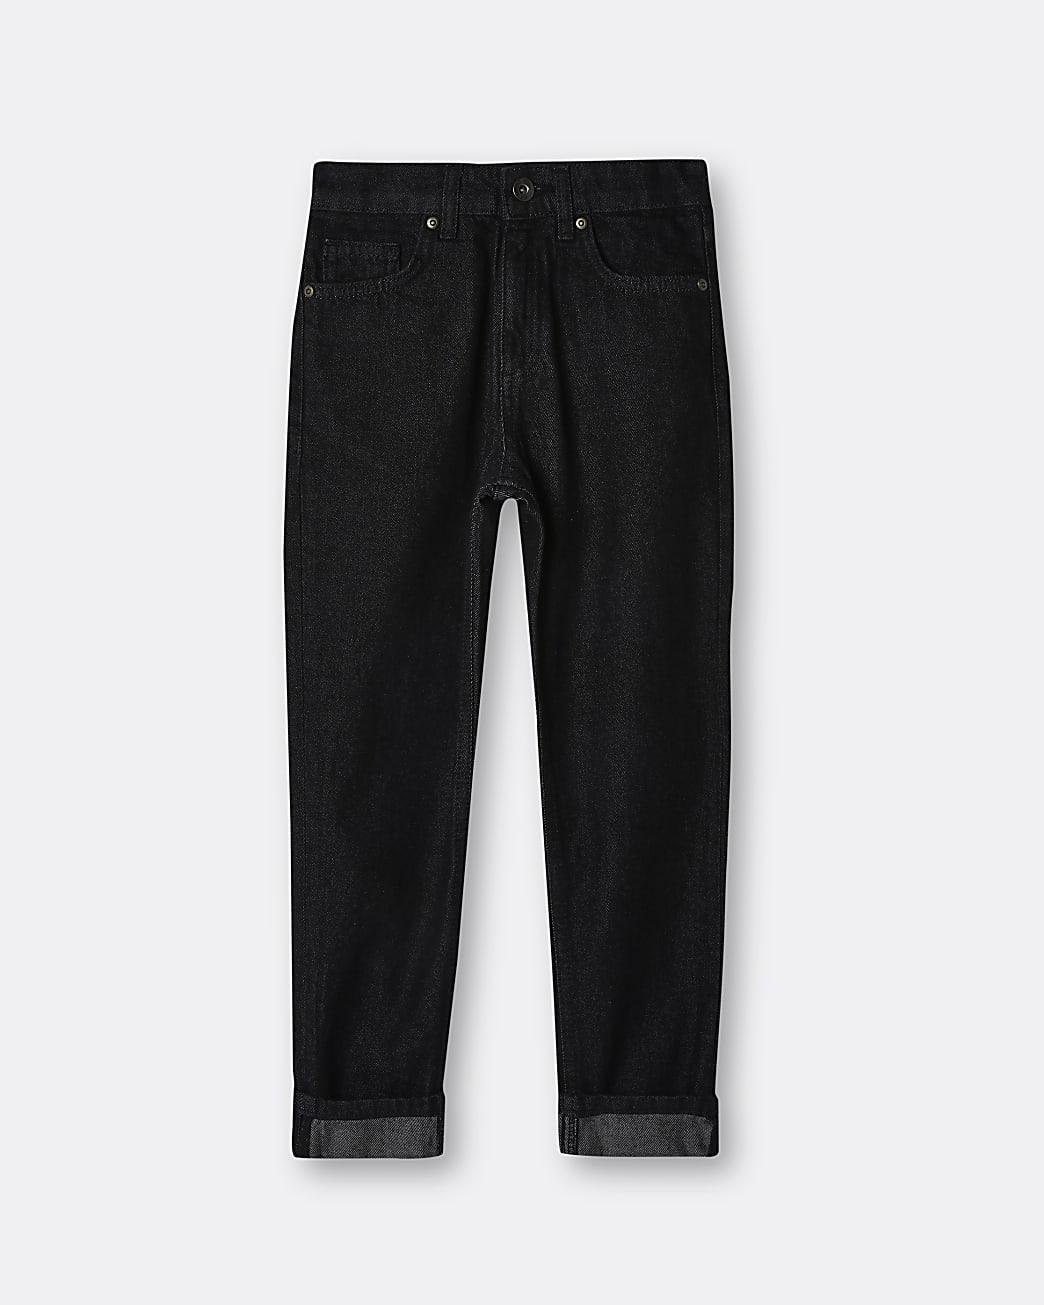 Boys black turn up skinny jeans